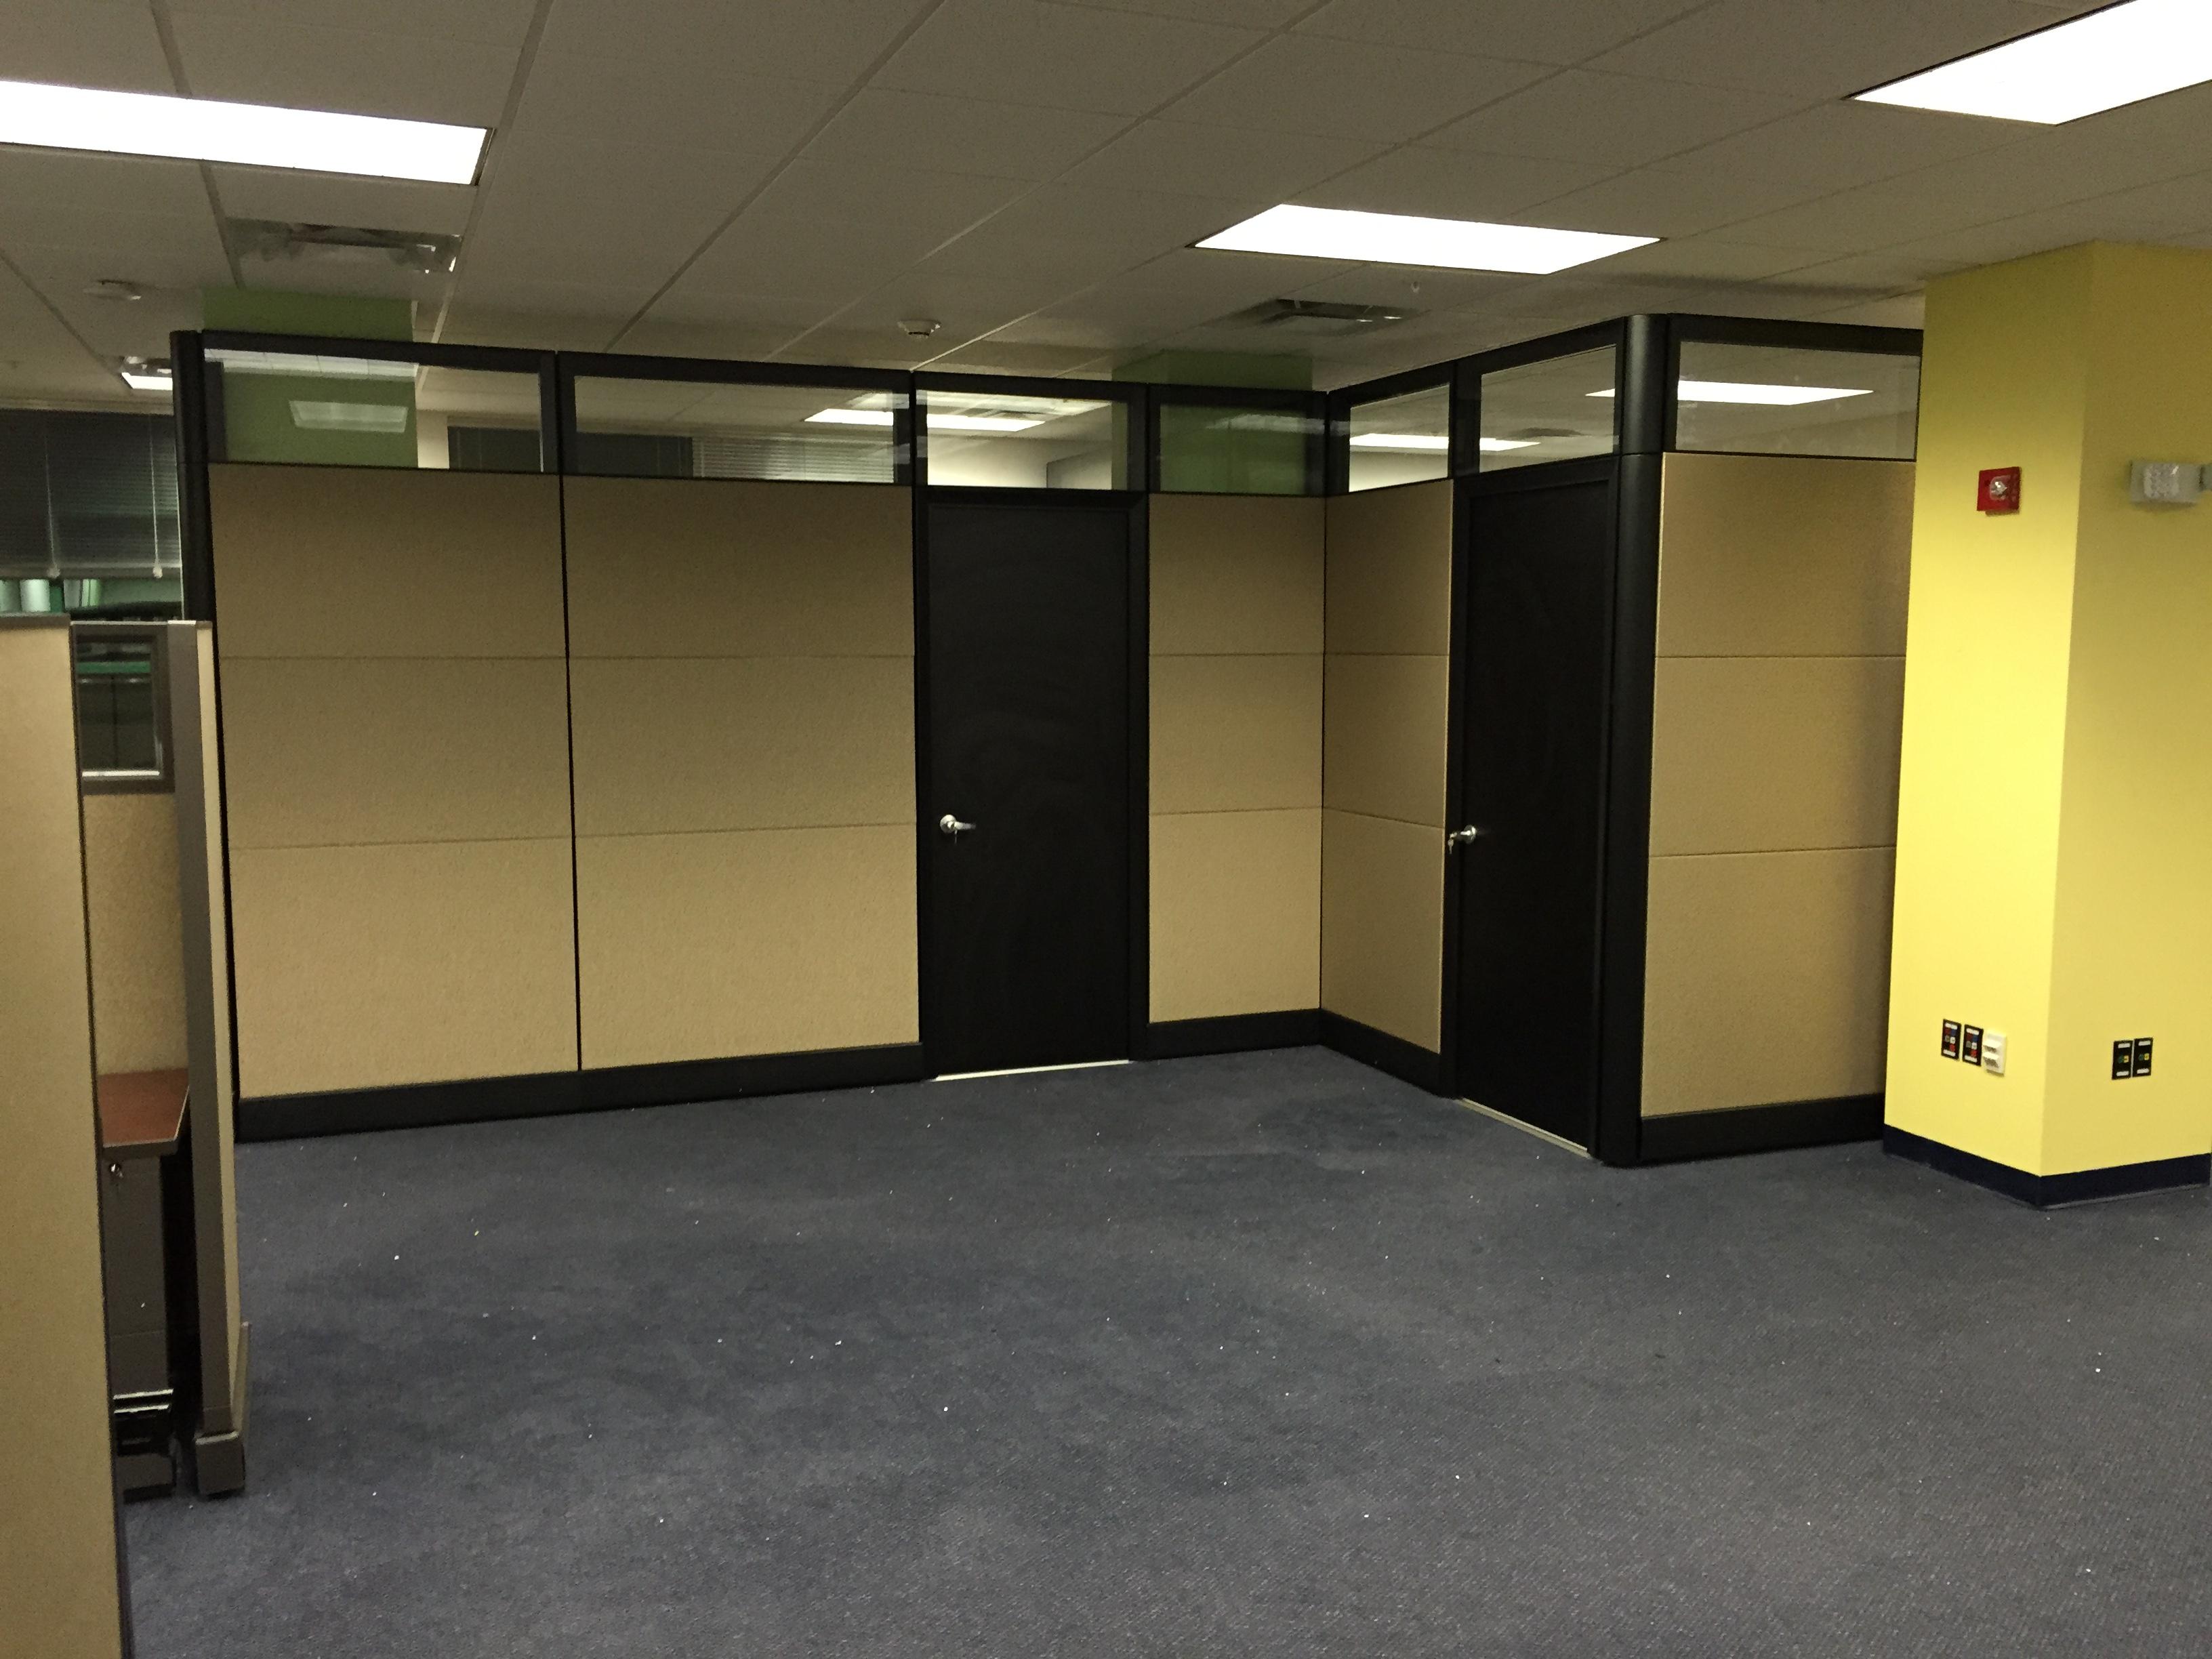 manasota-office-supplies-llc-20170320-172631-8-.jpg